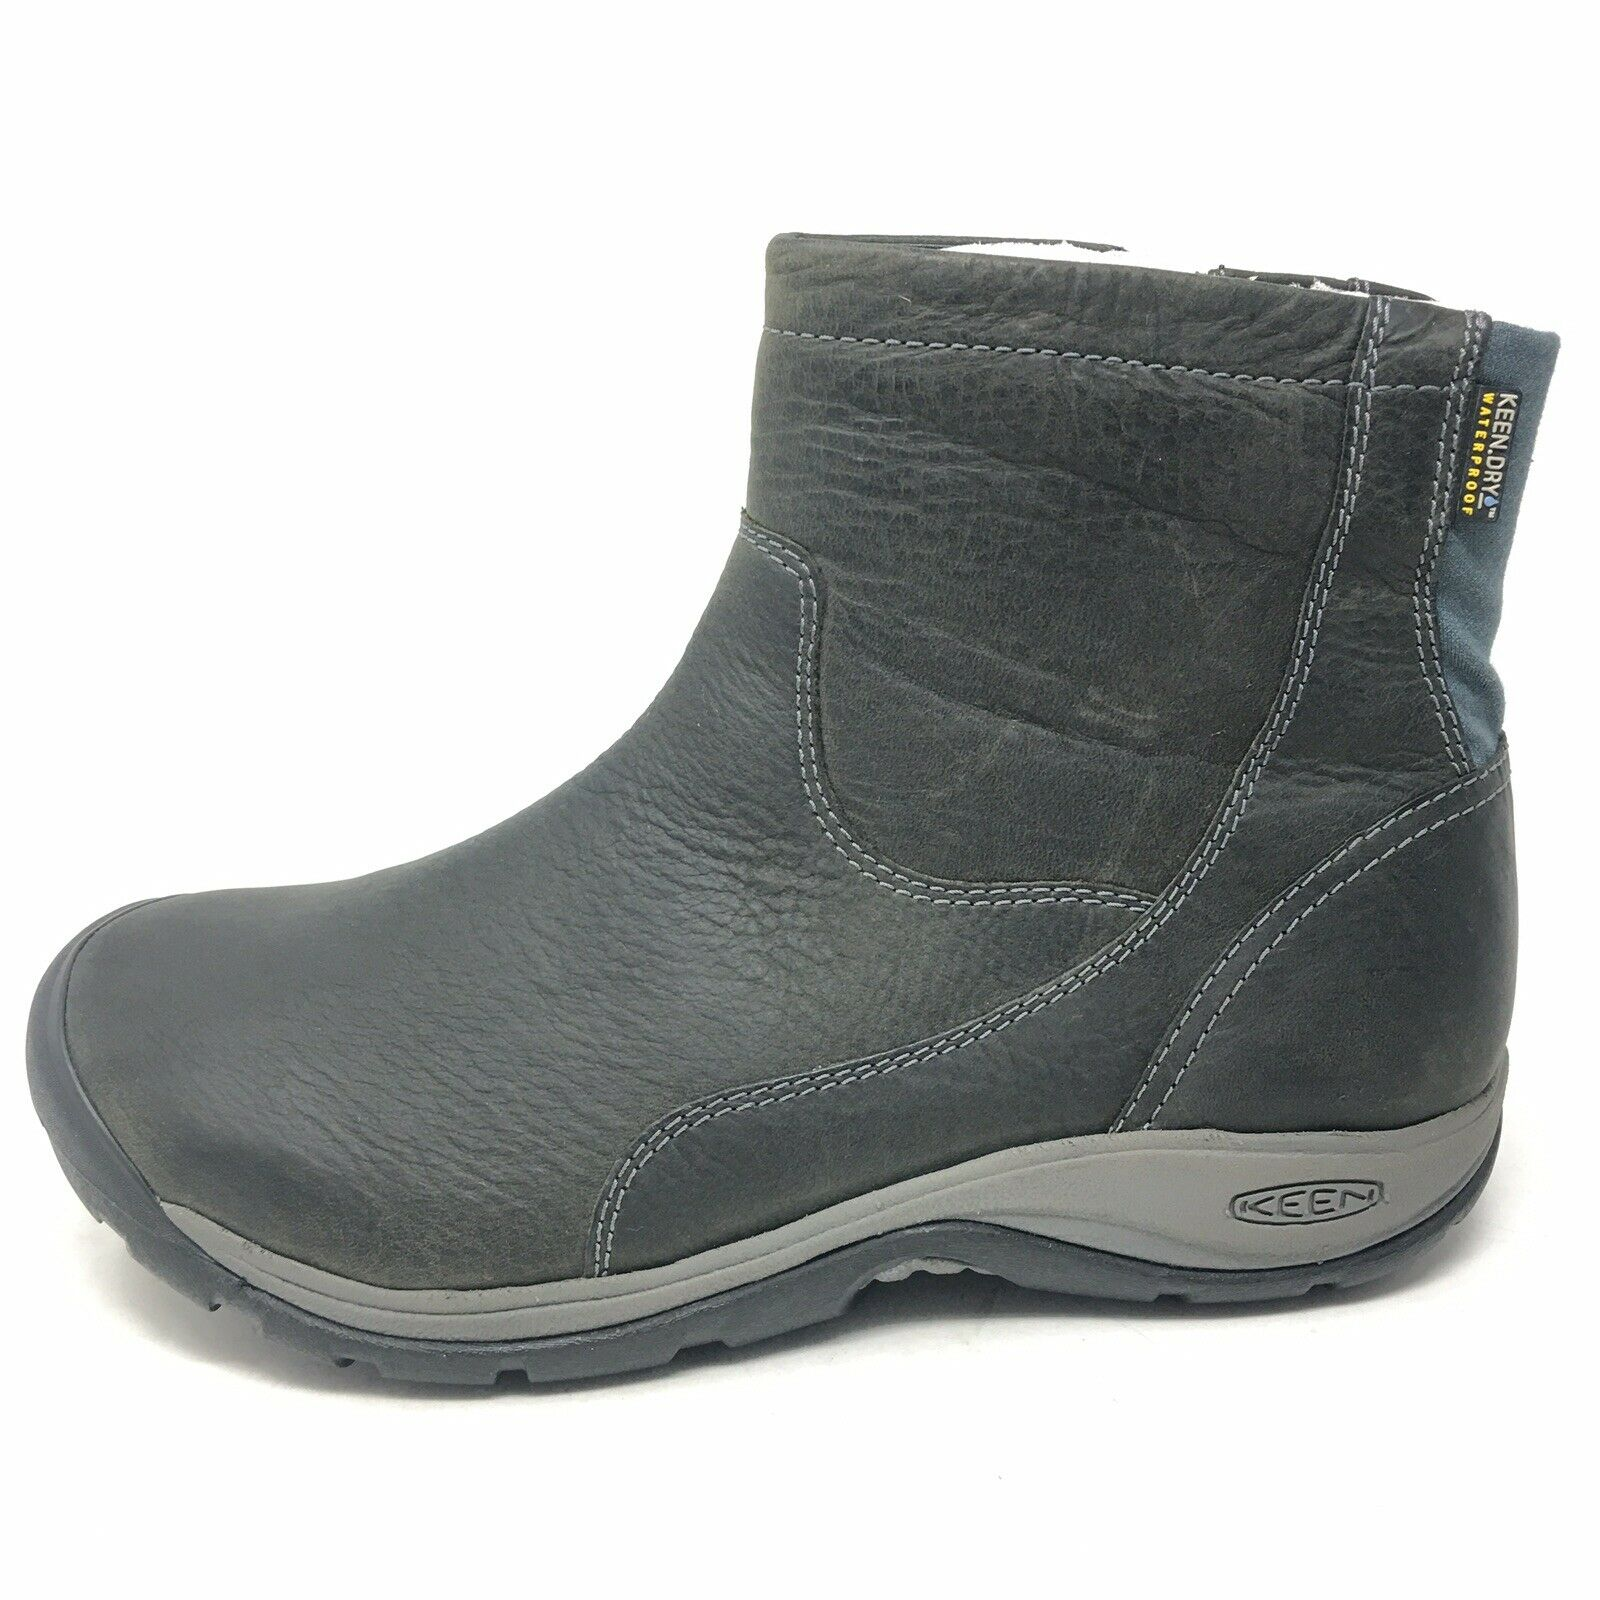 Keen Presidio II Mid Zip Up Waterproof donna 7 M Winter Casual stivali Marroneee  150